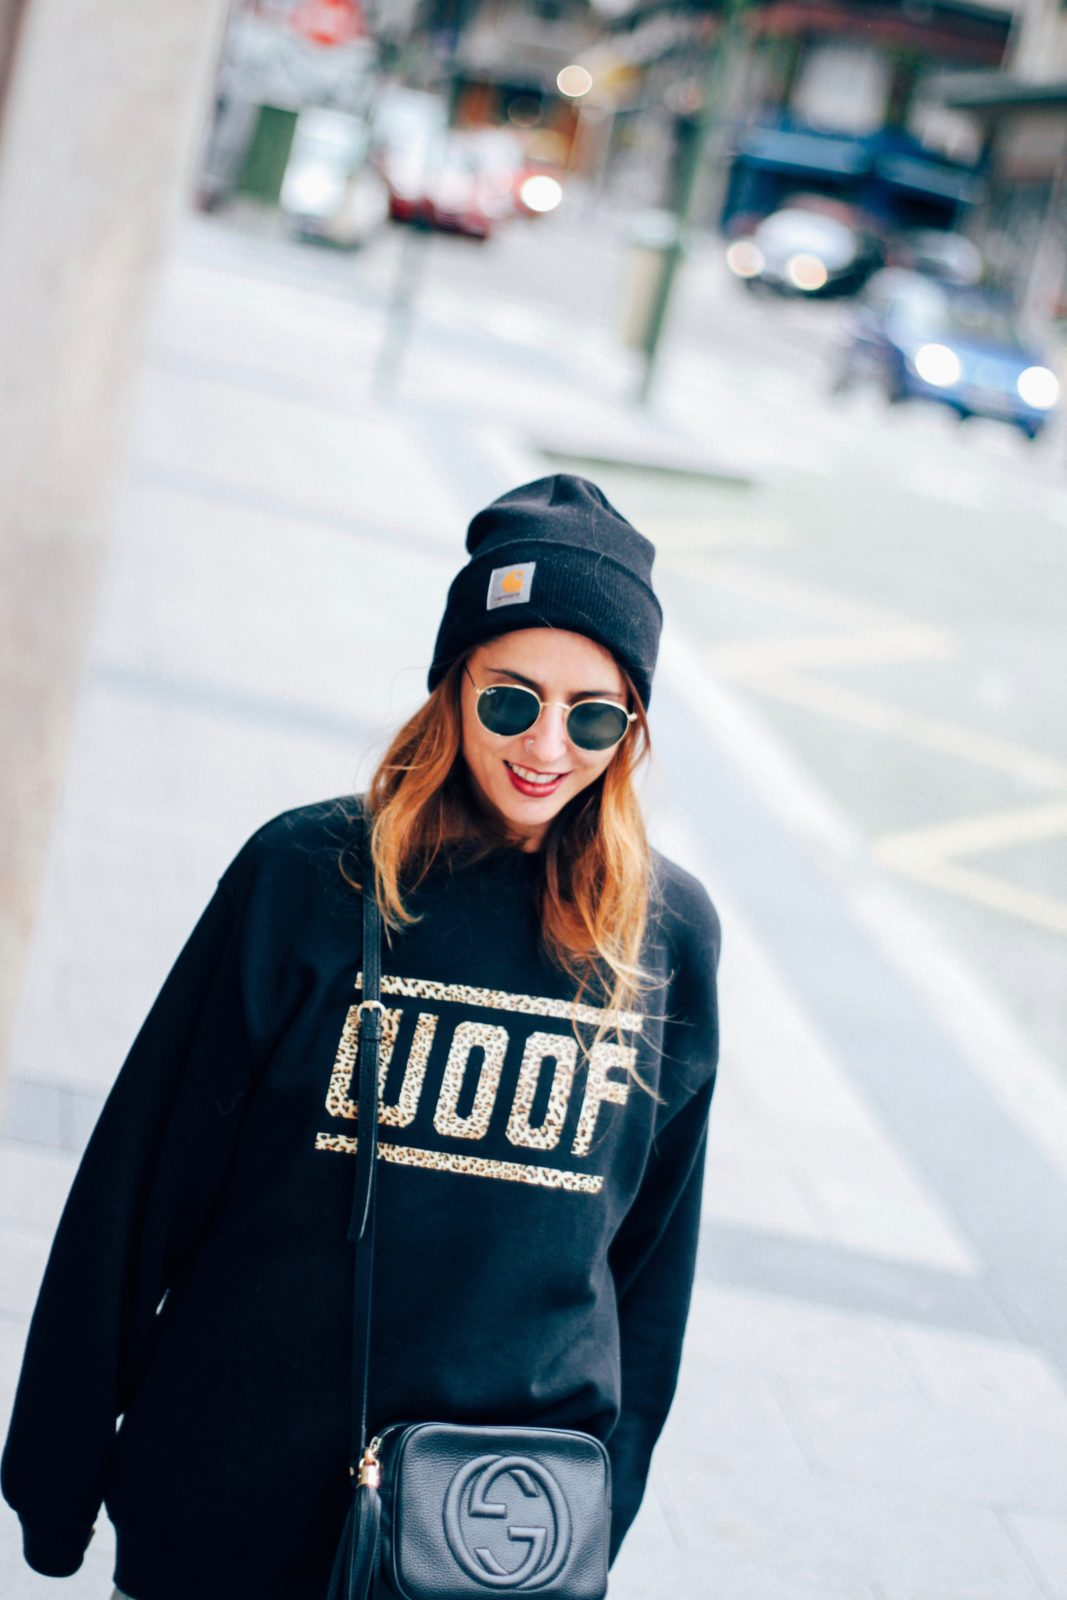 sudadera_old_dogs_falda_de_tul_vans_beanie_carhartt_look_donkeycool_street_style-34